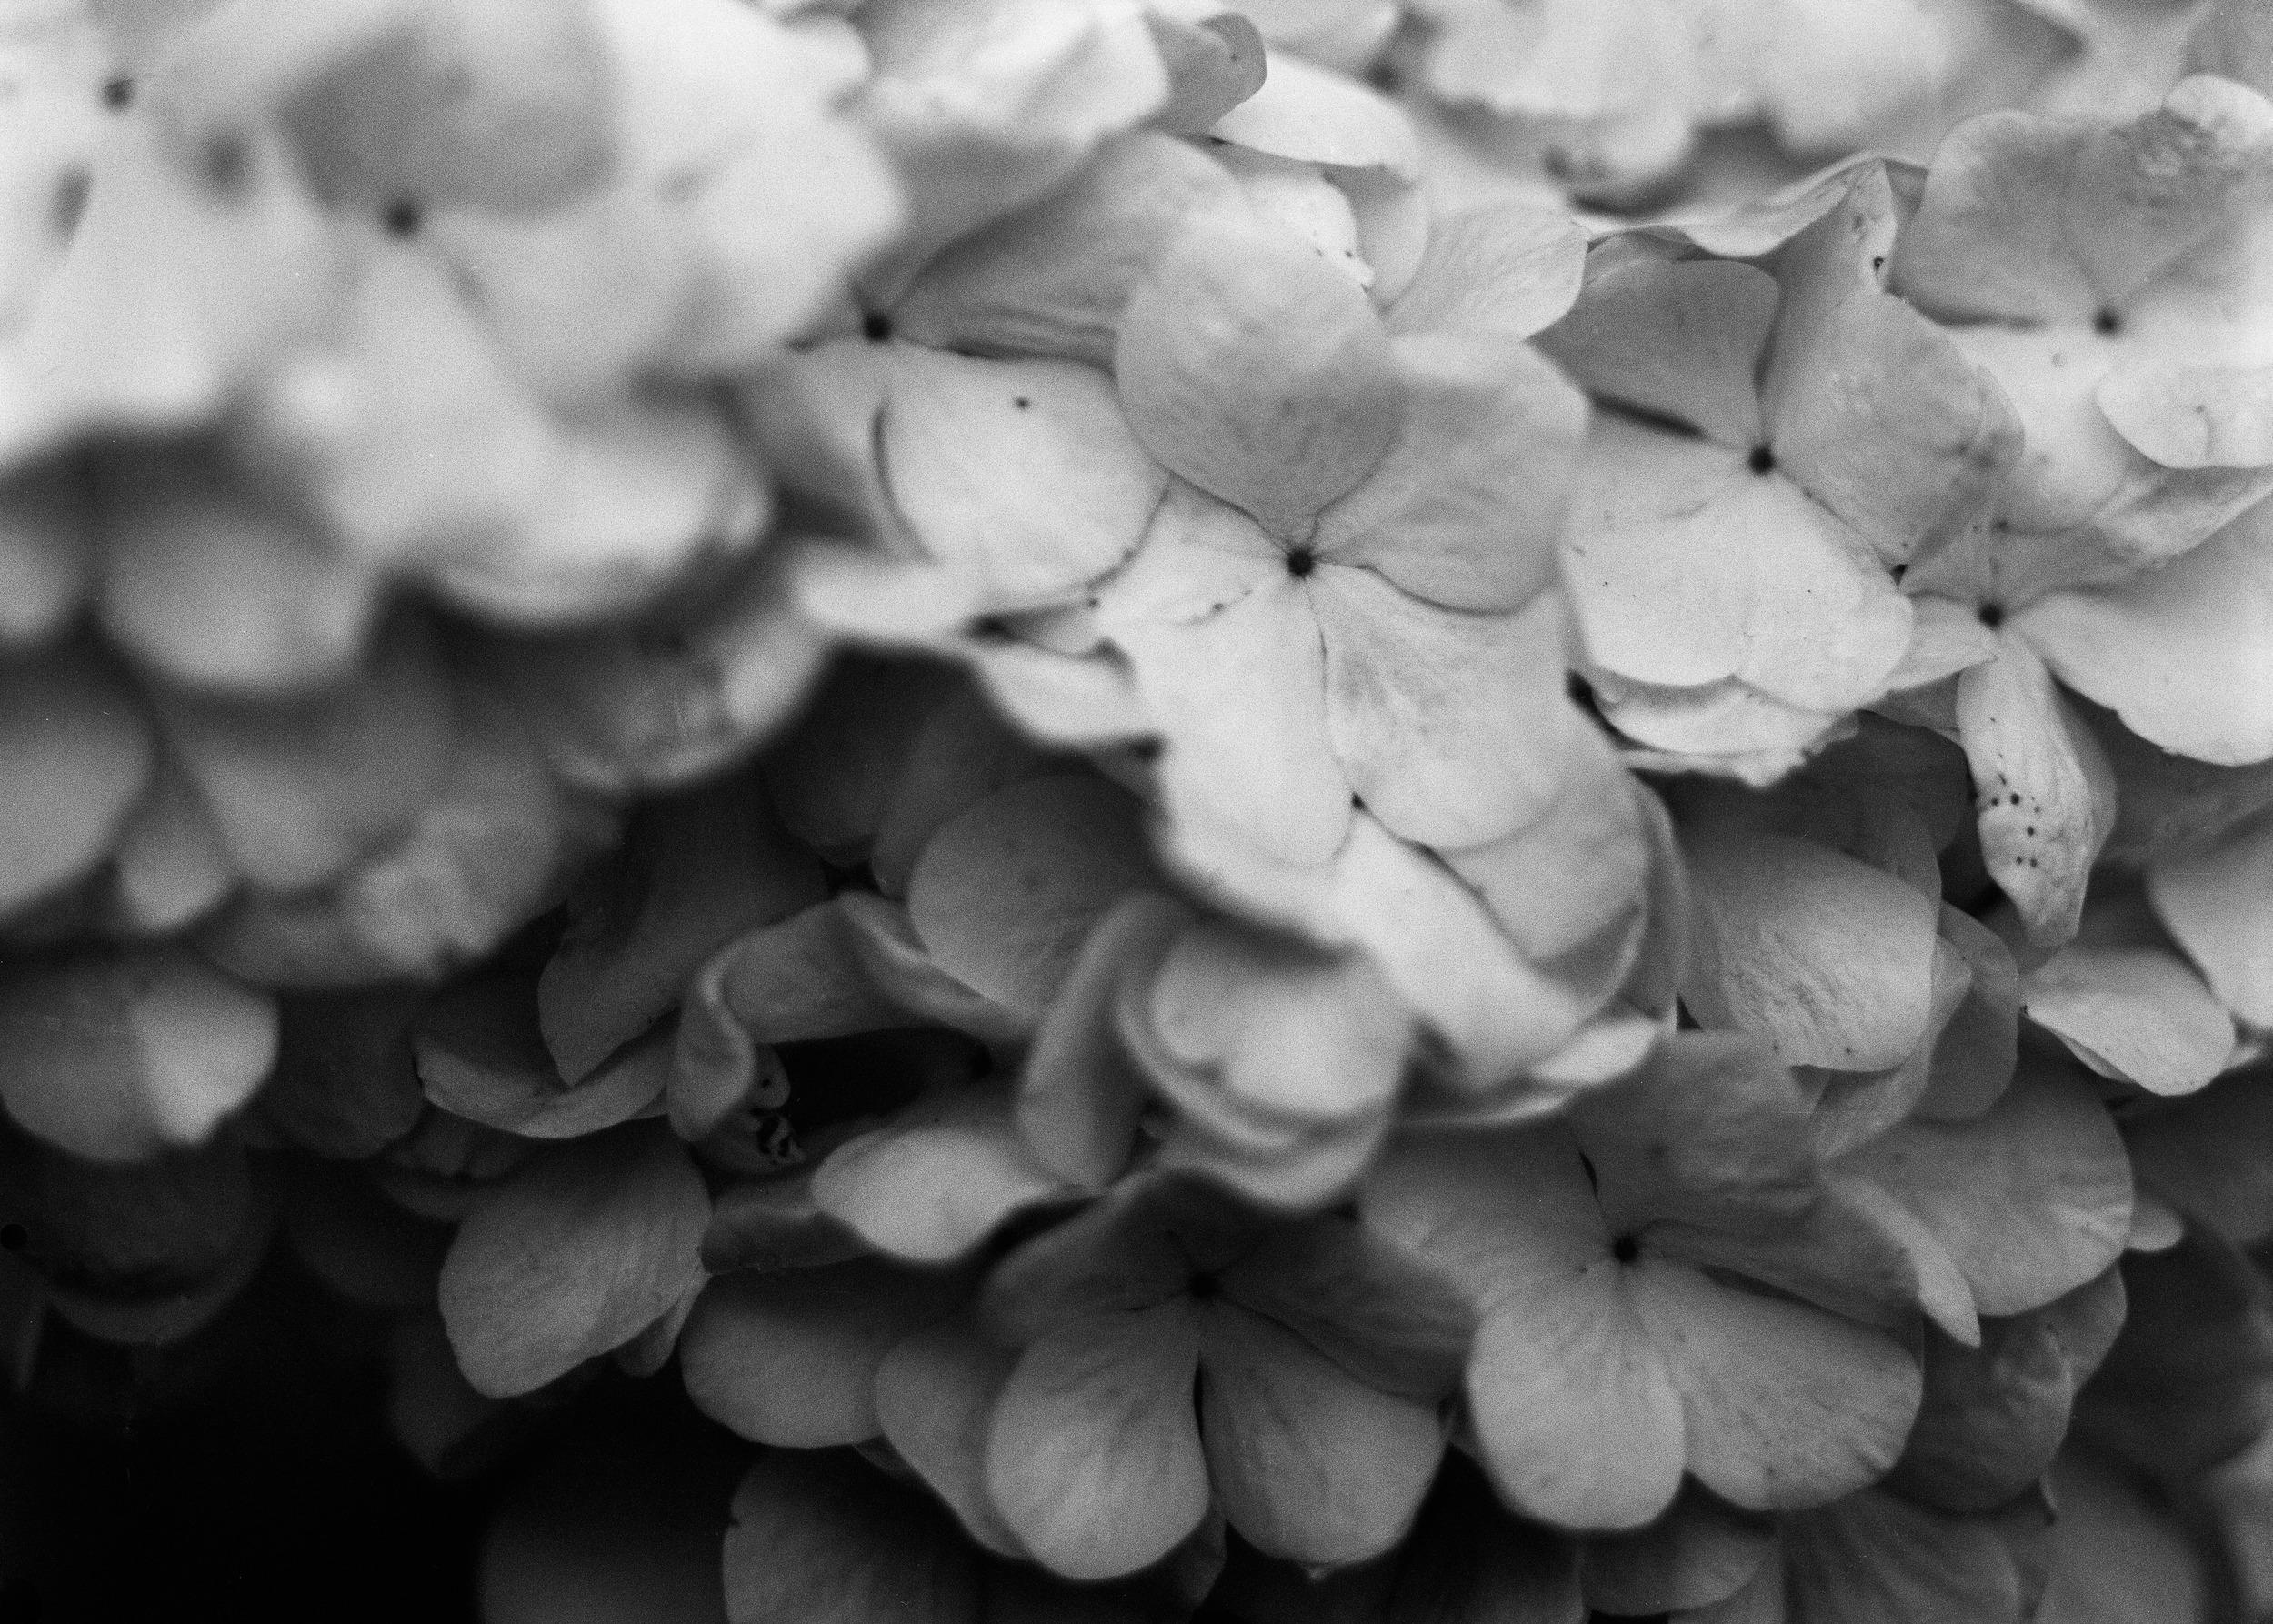 hydrangea   Spring 2013 Sewanee, TN  scan of 4X5 original negative